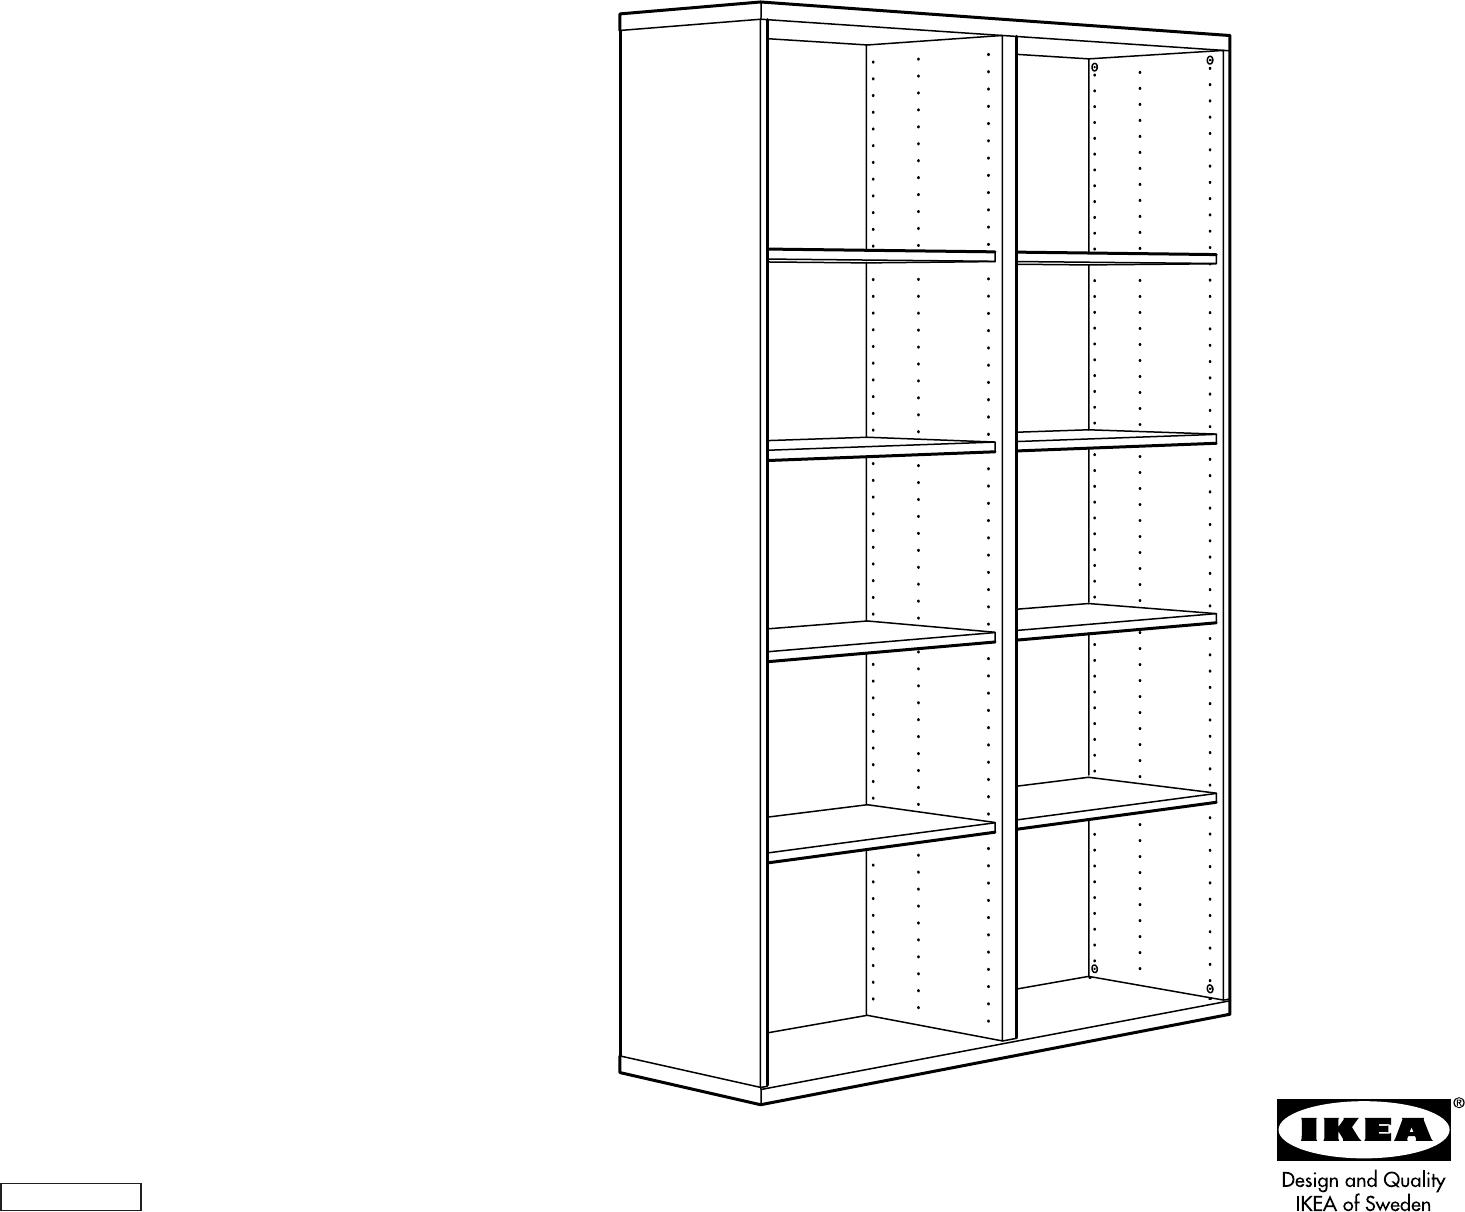 Ikea Ideas For Small Living Room ~ Handleiding Ikea Besta kast 2 (pagina 1 van 10) (2,27 mb Dansk